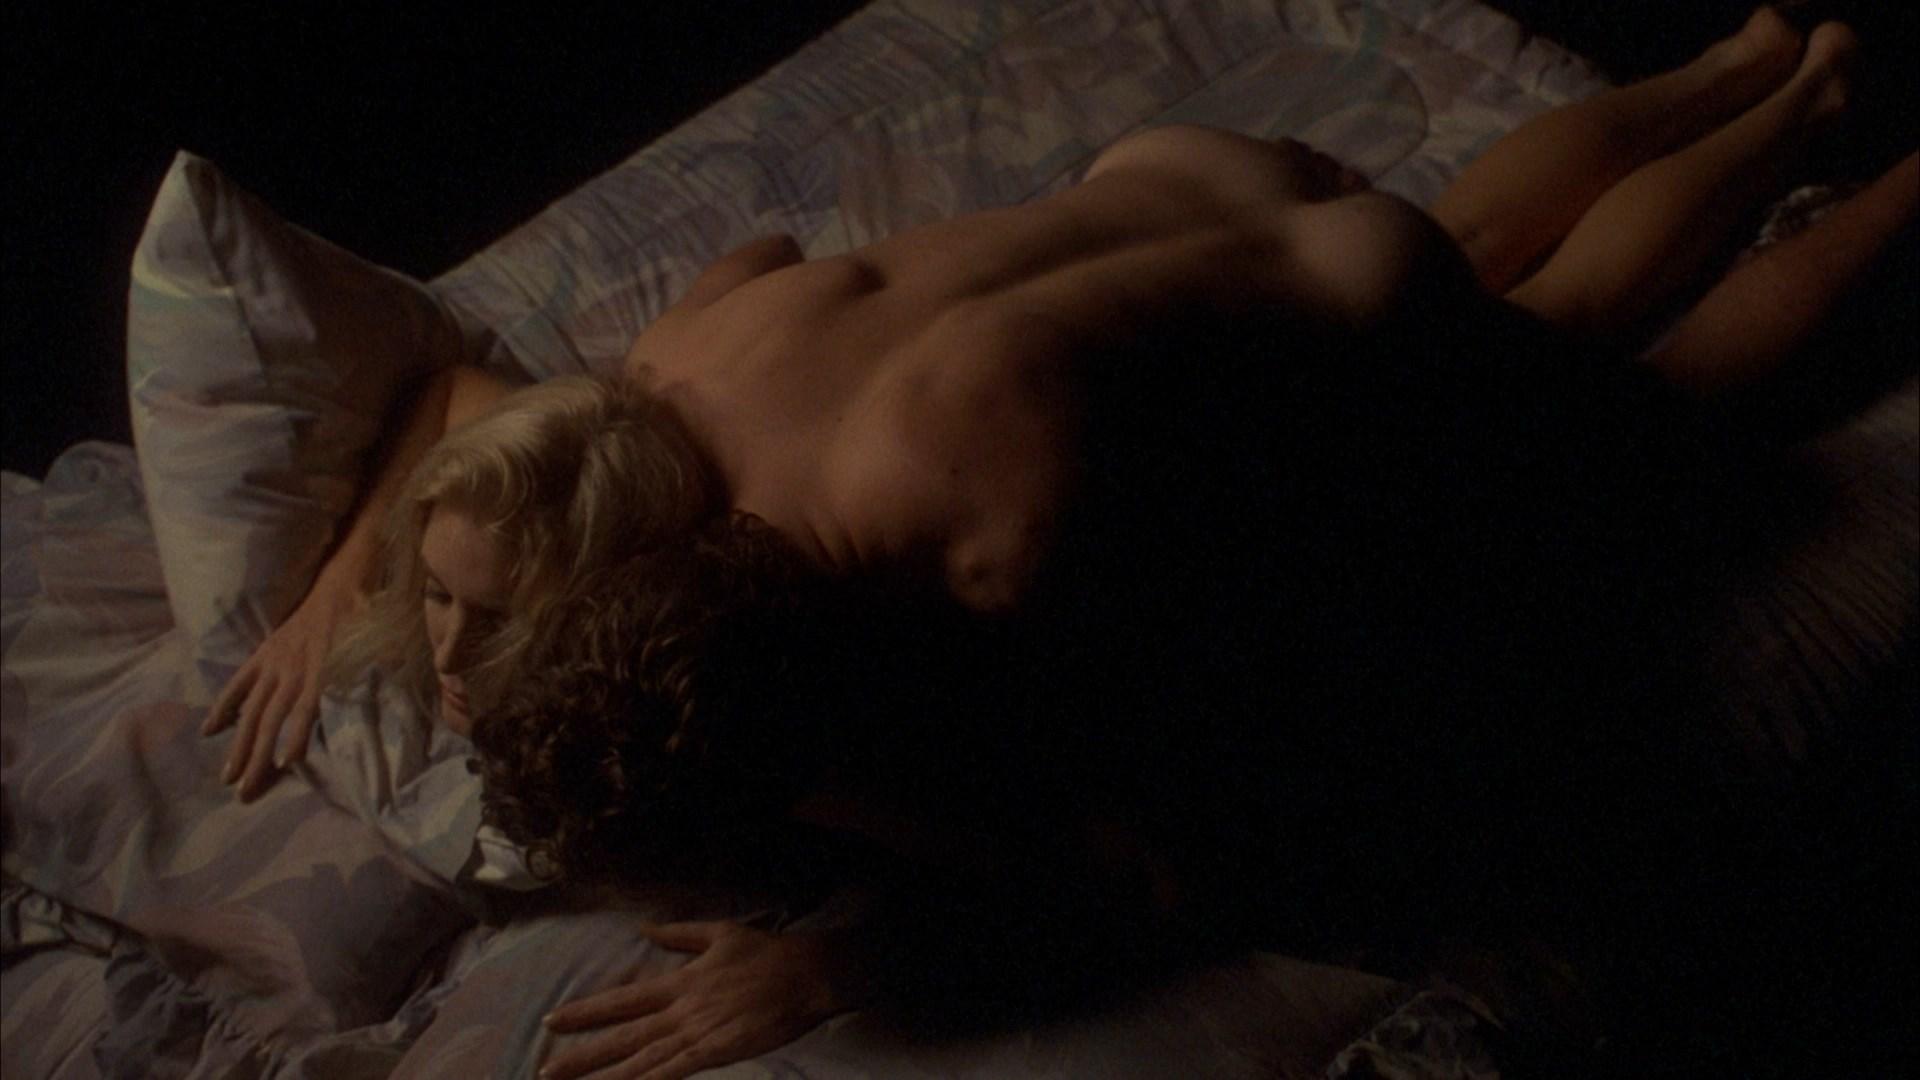 Shannon tweed hot sex in illicit dreams